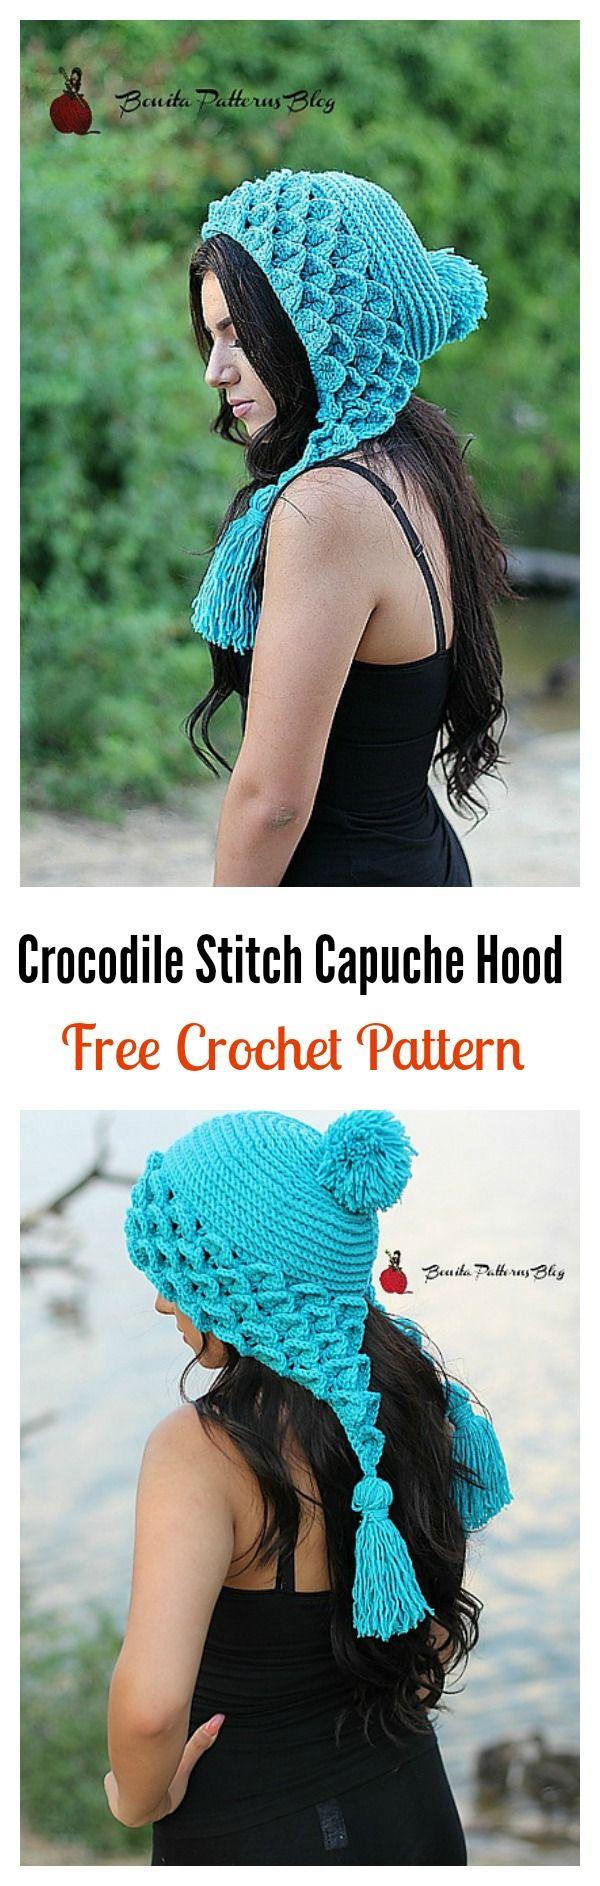 Crochet Crocodile Stitch Capuche Hood Free Pattern